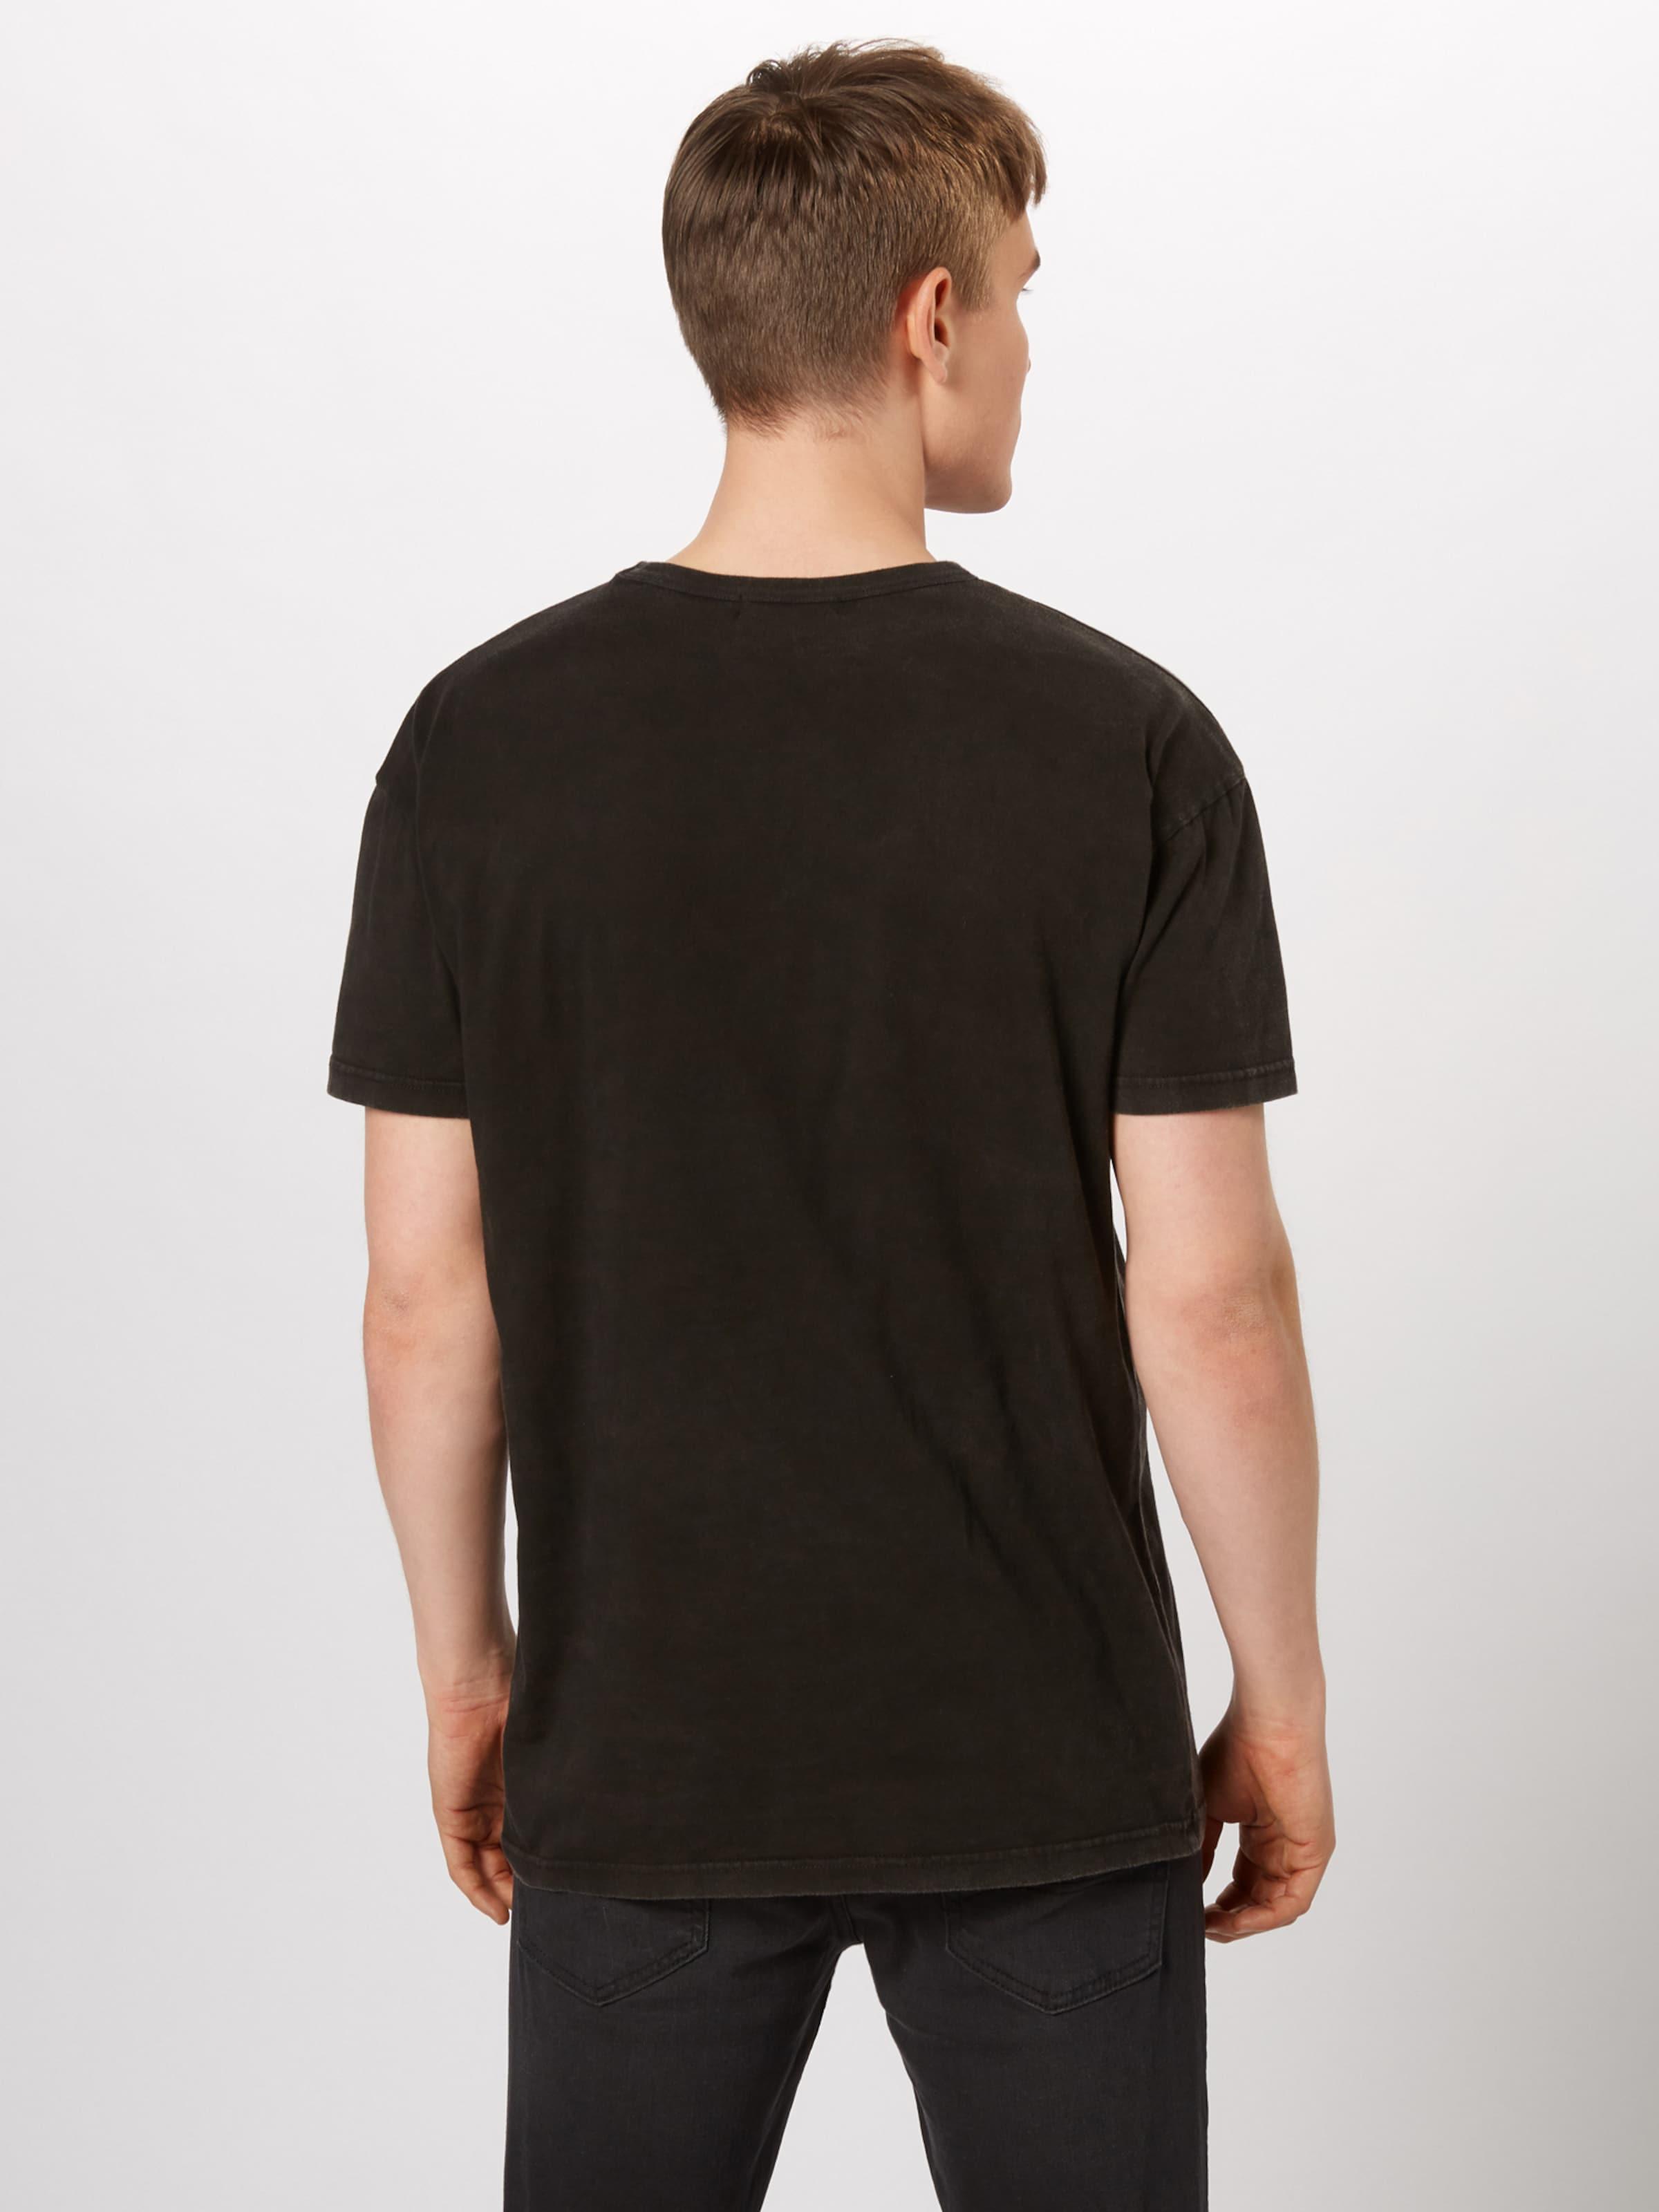 'customs' shirt T Derbe In Schwarz m8nvN0w